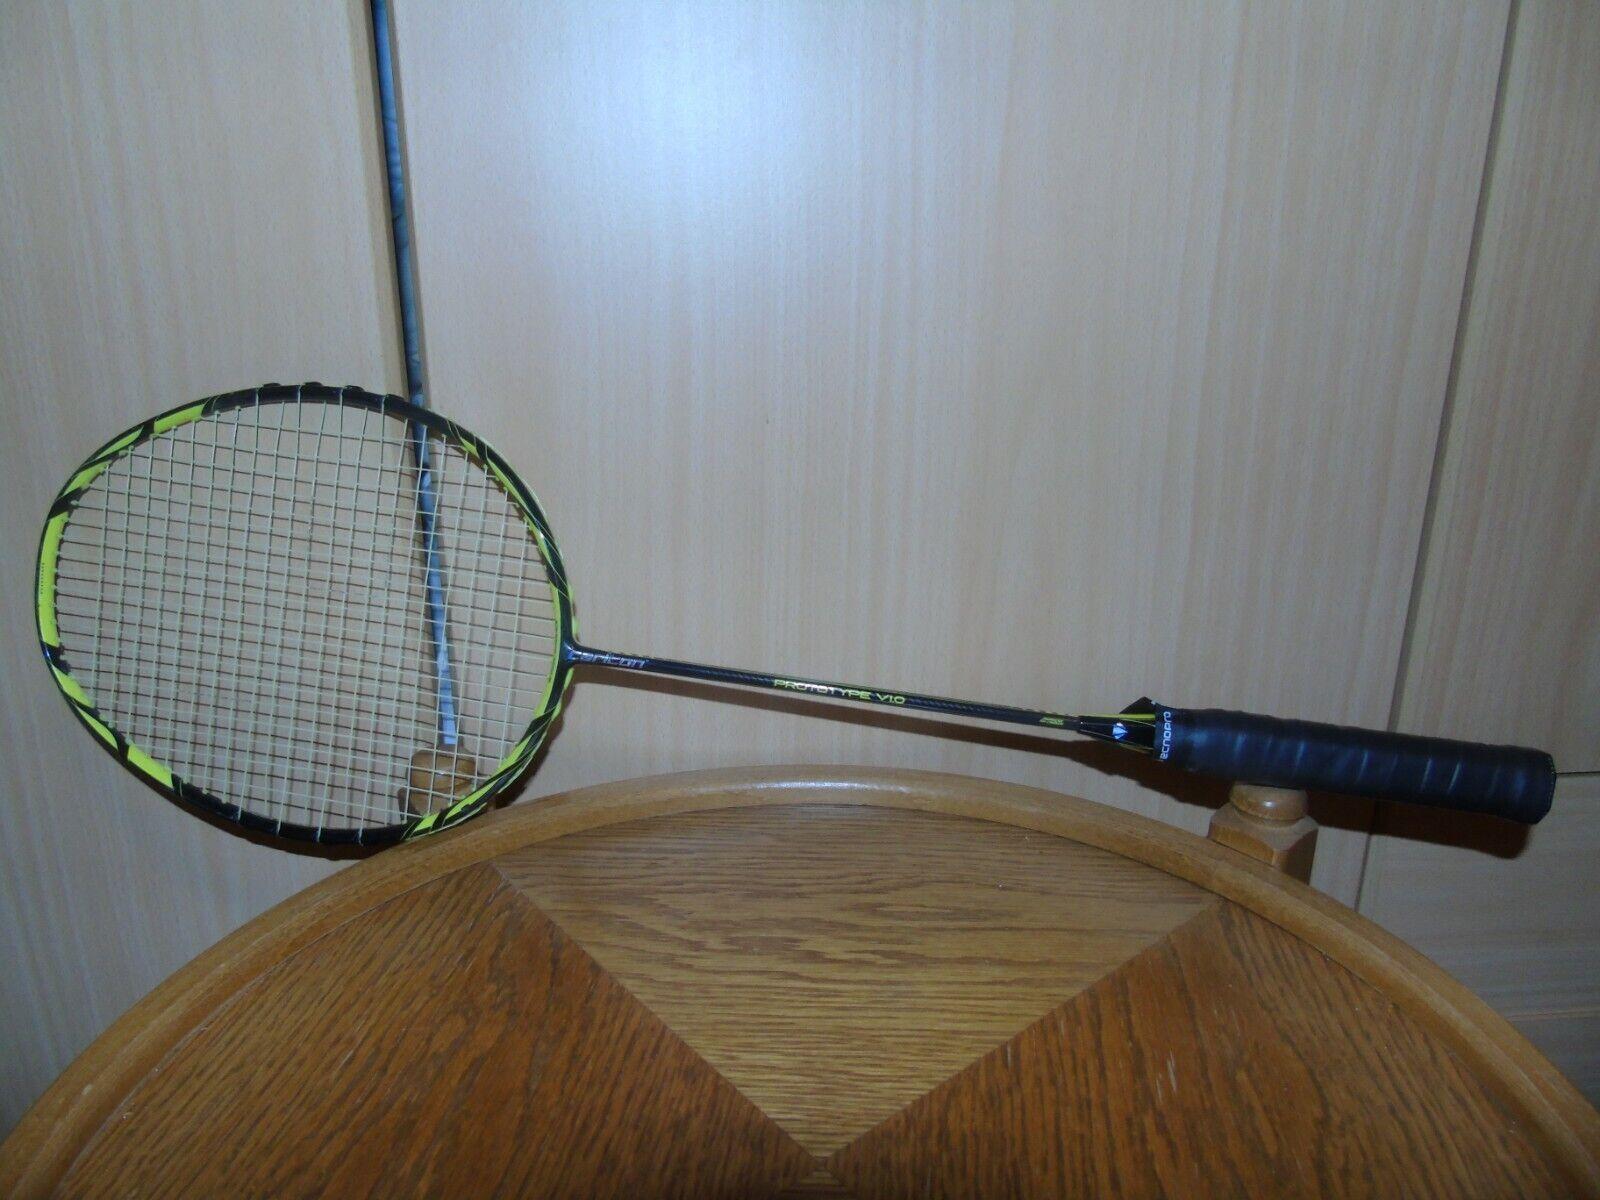 Carlton Razor Prototype V1.0 Badminton Schläger mit Tasche